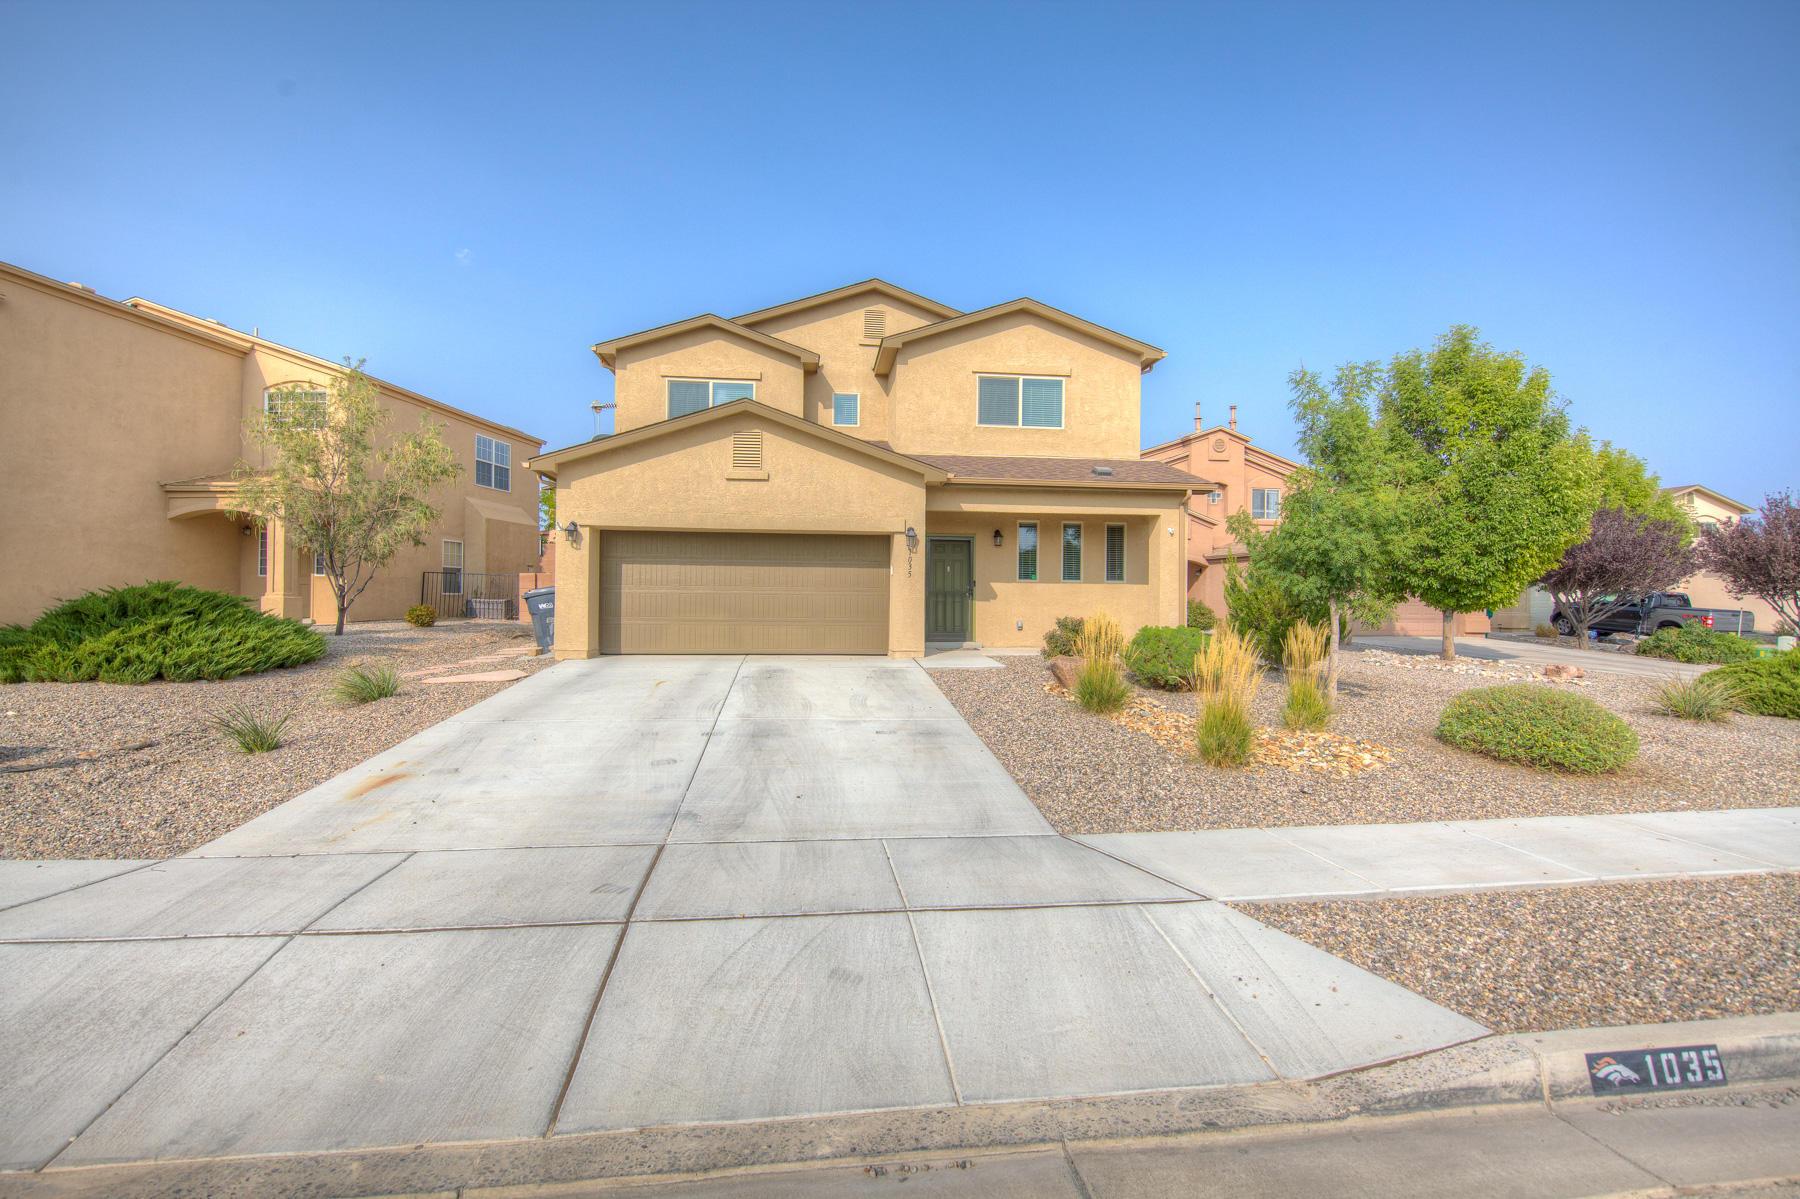 1035 DESERT WILLOW Place NE Property Photo - Rio Rancho, NM real estate listing